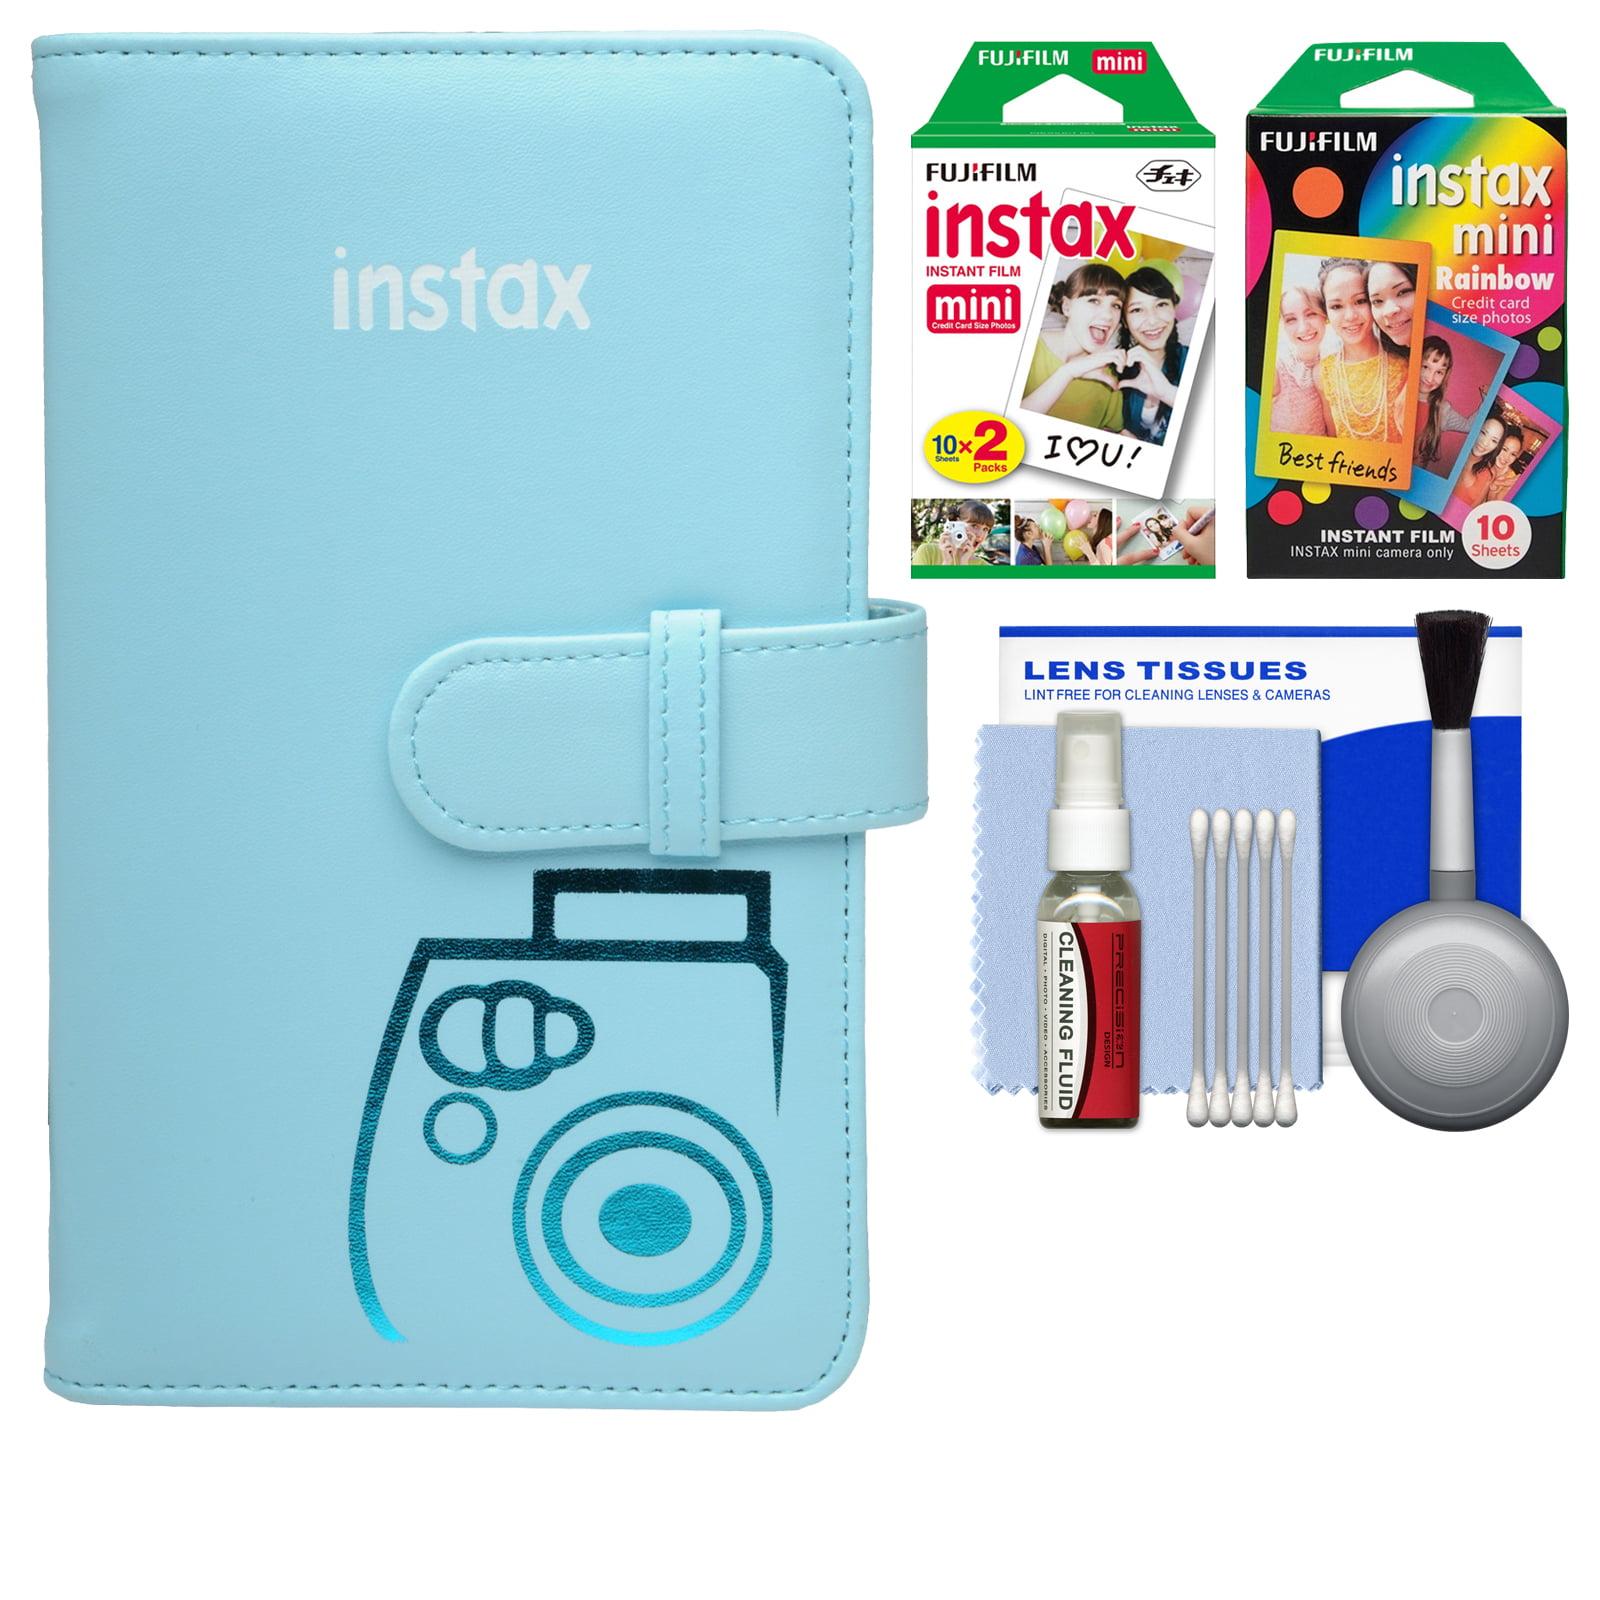 Fujifilm Instax Mini Wallet 108 Photo Album Blue With 20 Color